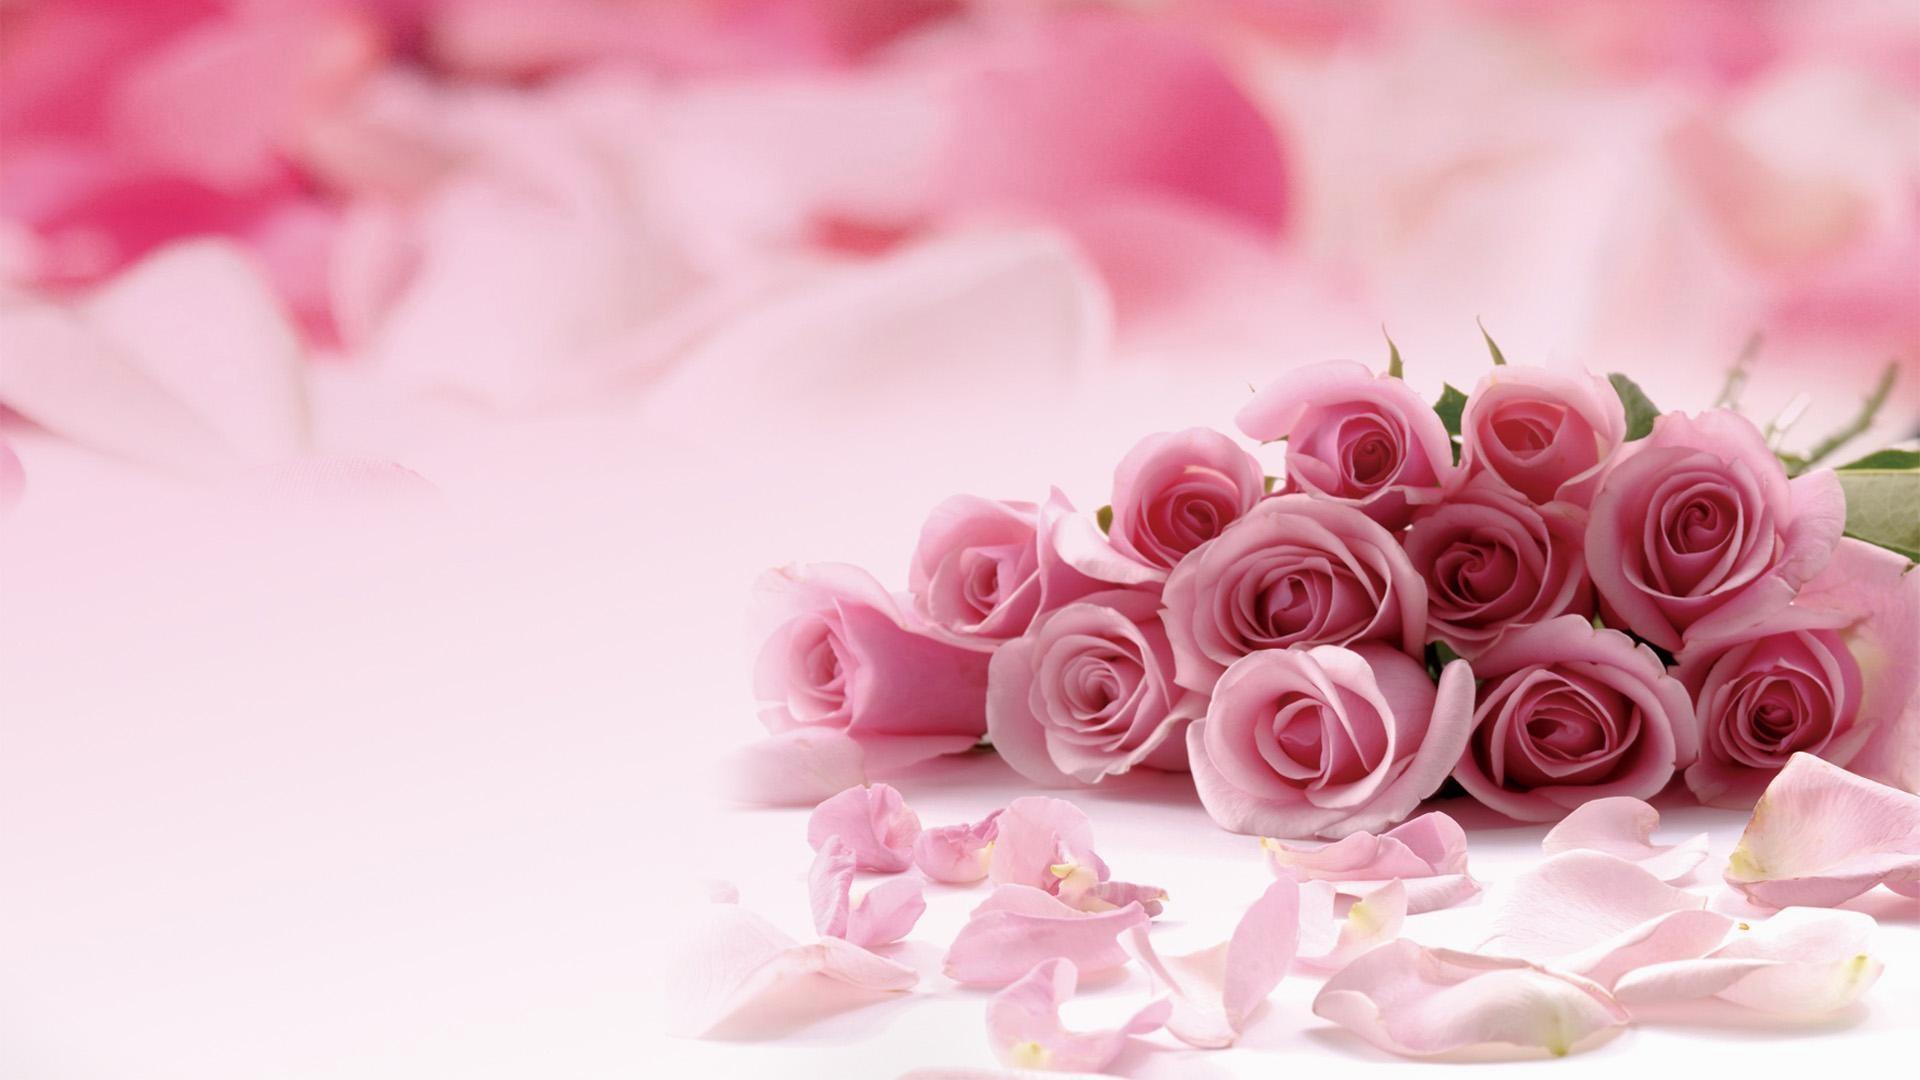 7. pink-girly-wallpaper-HD7-600×338